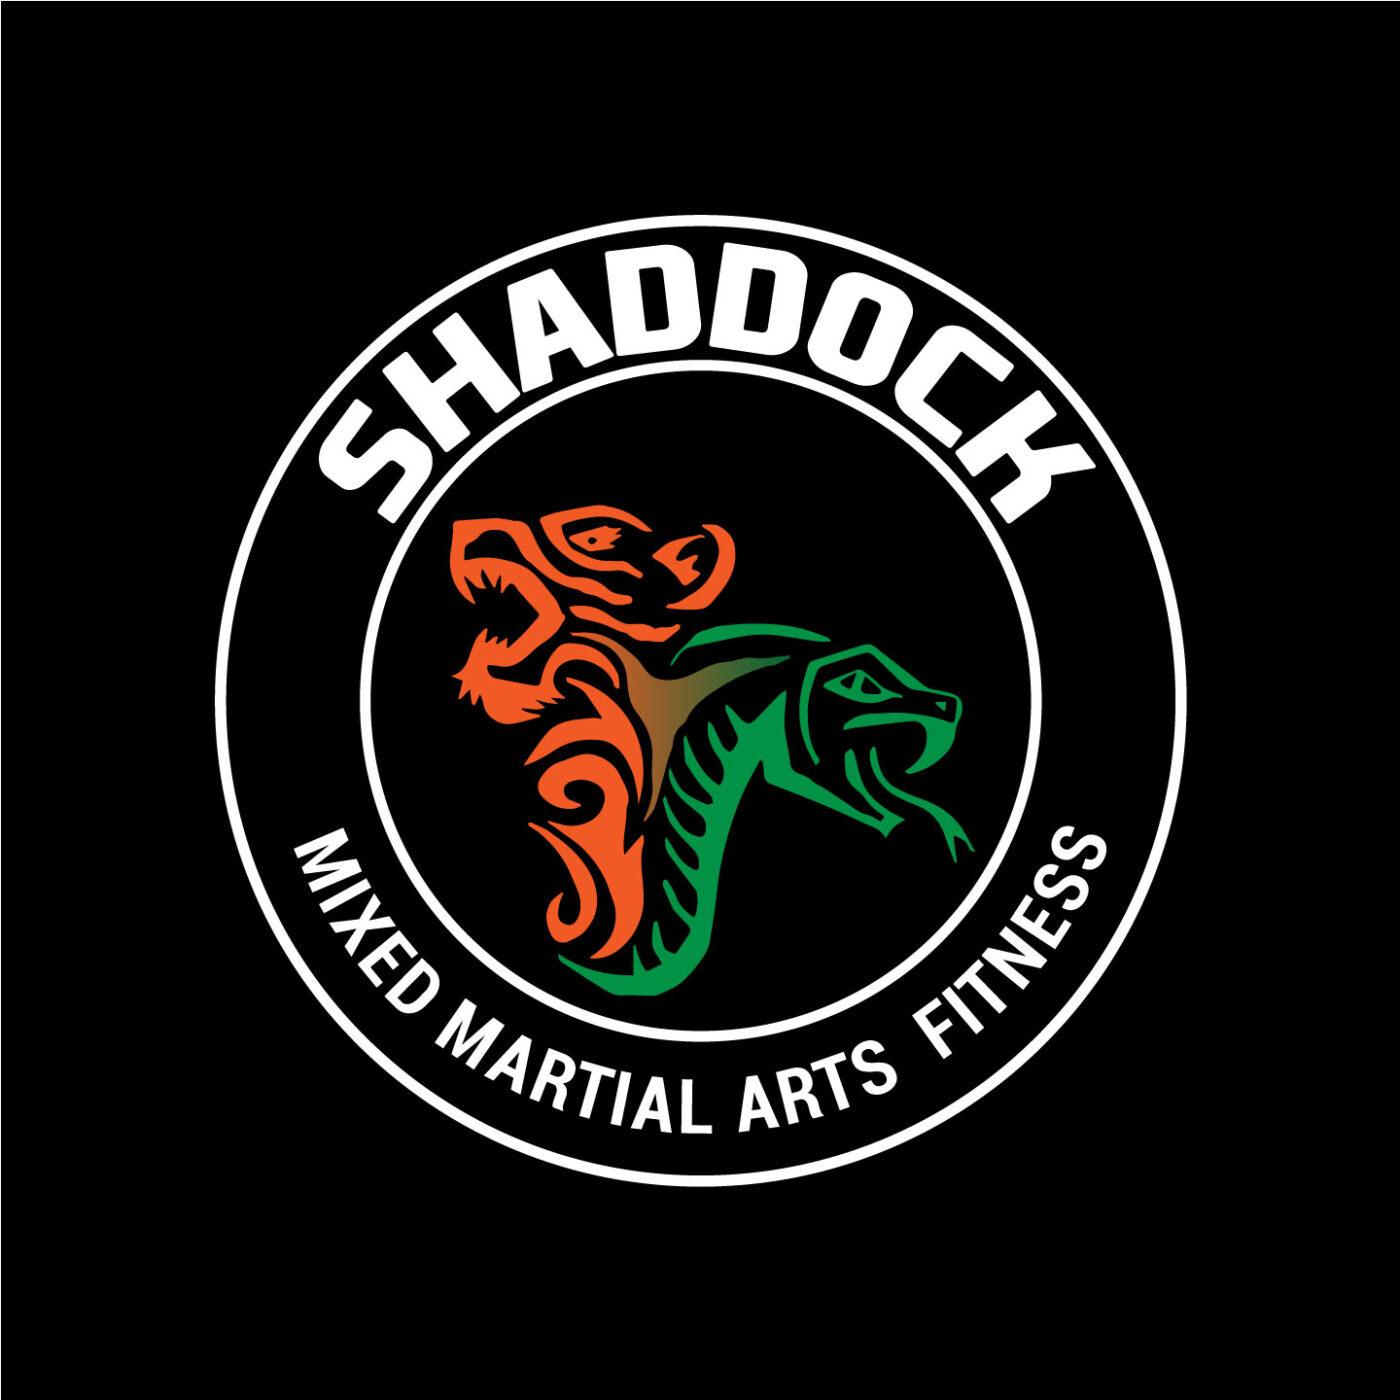 Shaddock MMA Fitness